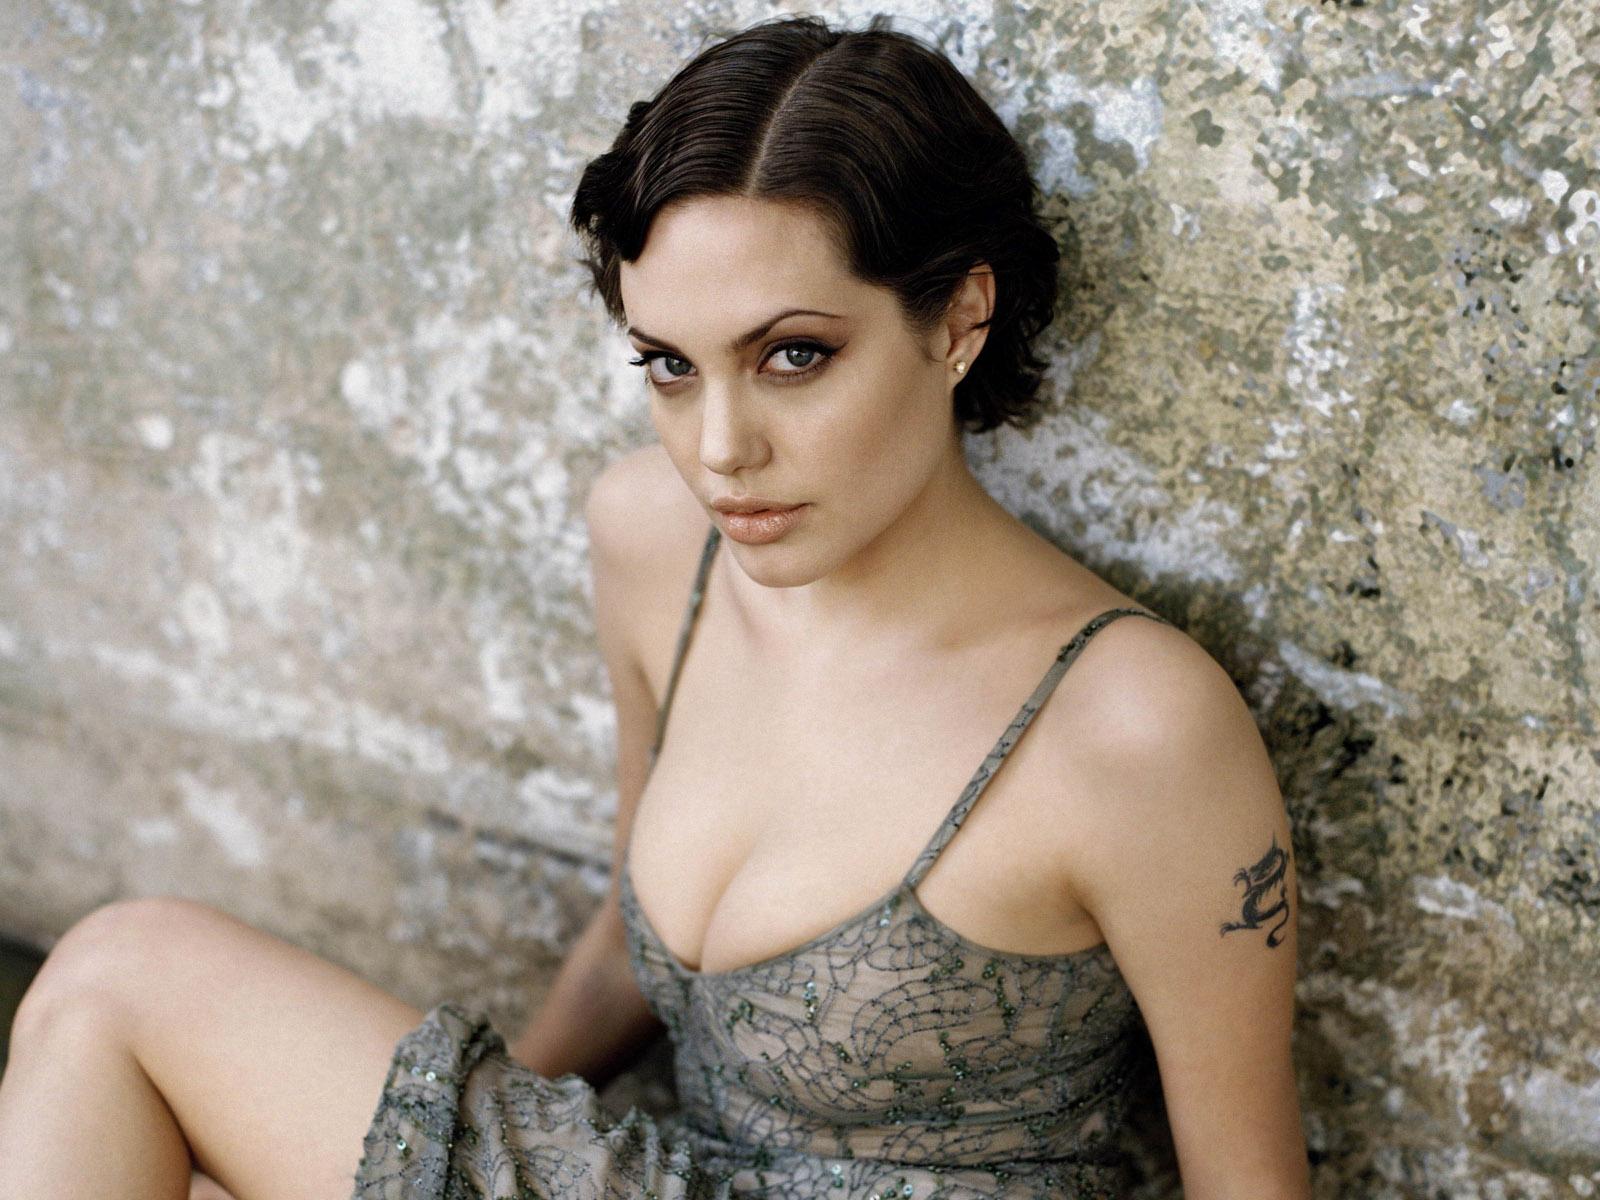 Sexy Angelina Jolie Nude Hot Free Pic